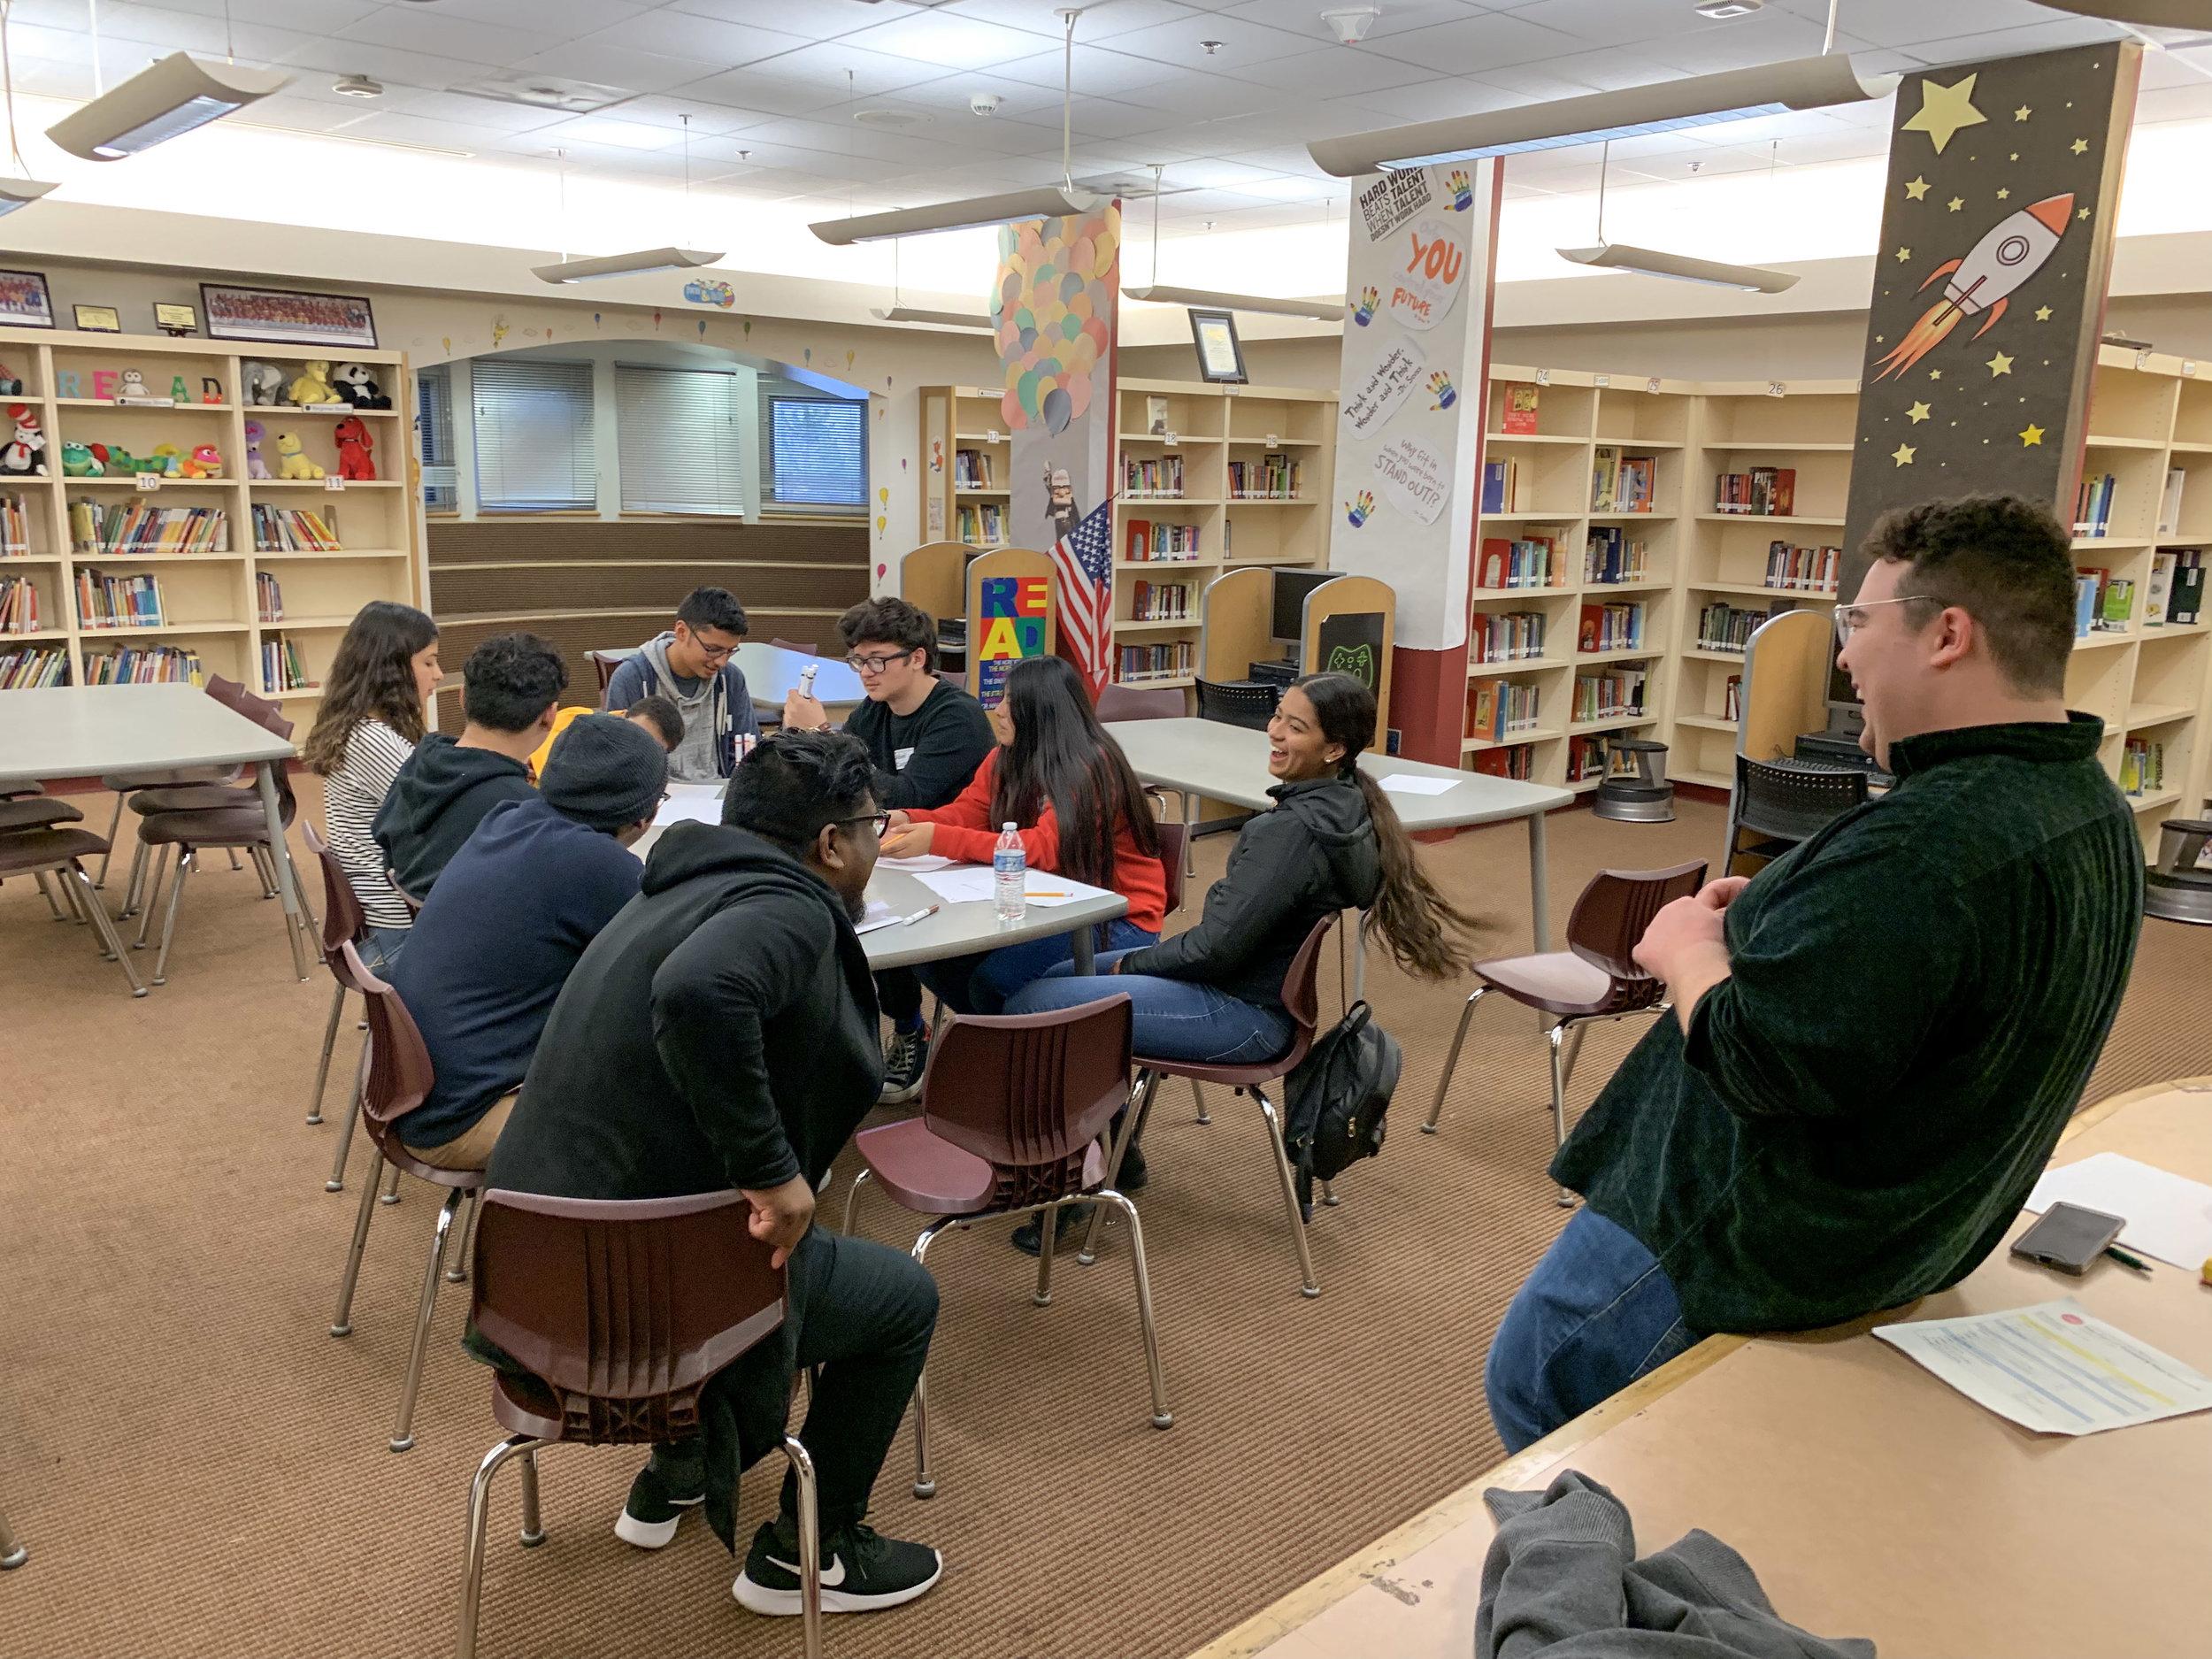 HP mentors from various neighborhoods across Los Angeles generating solutions